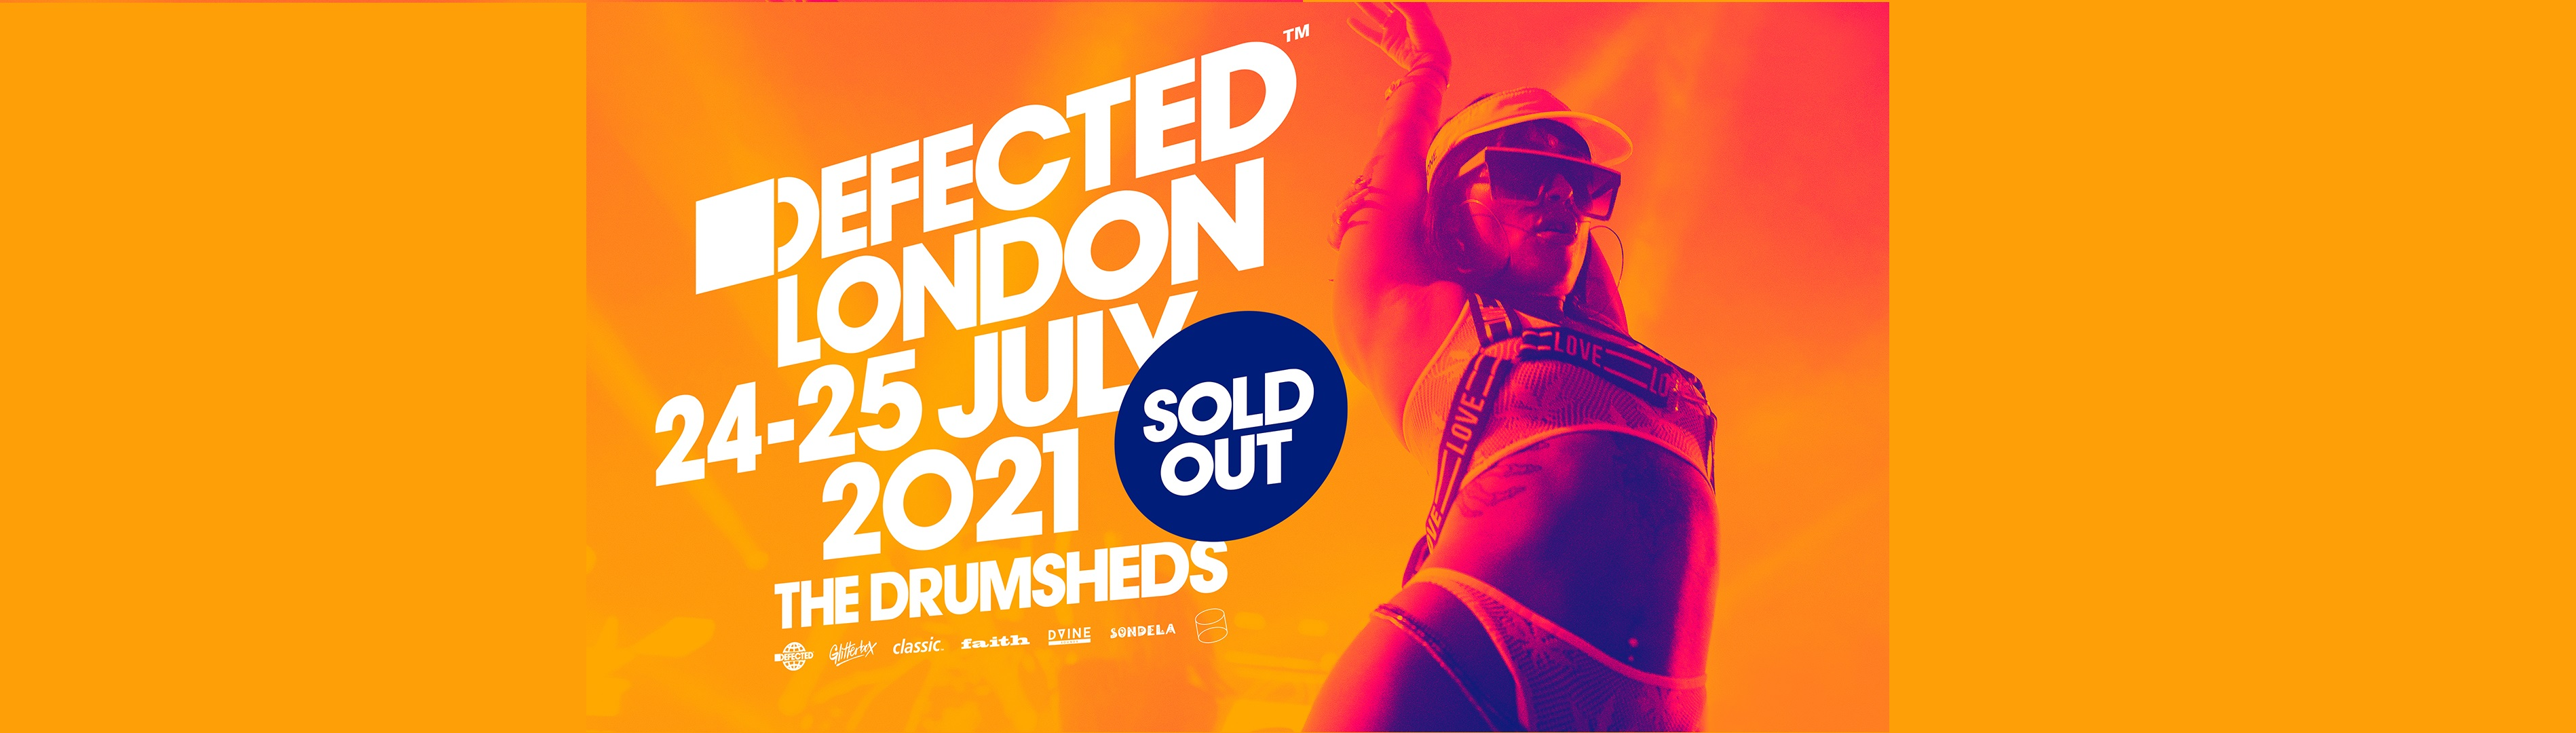 Defected London